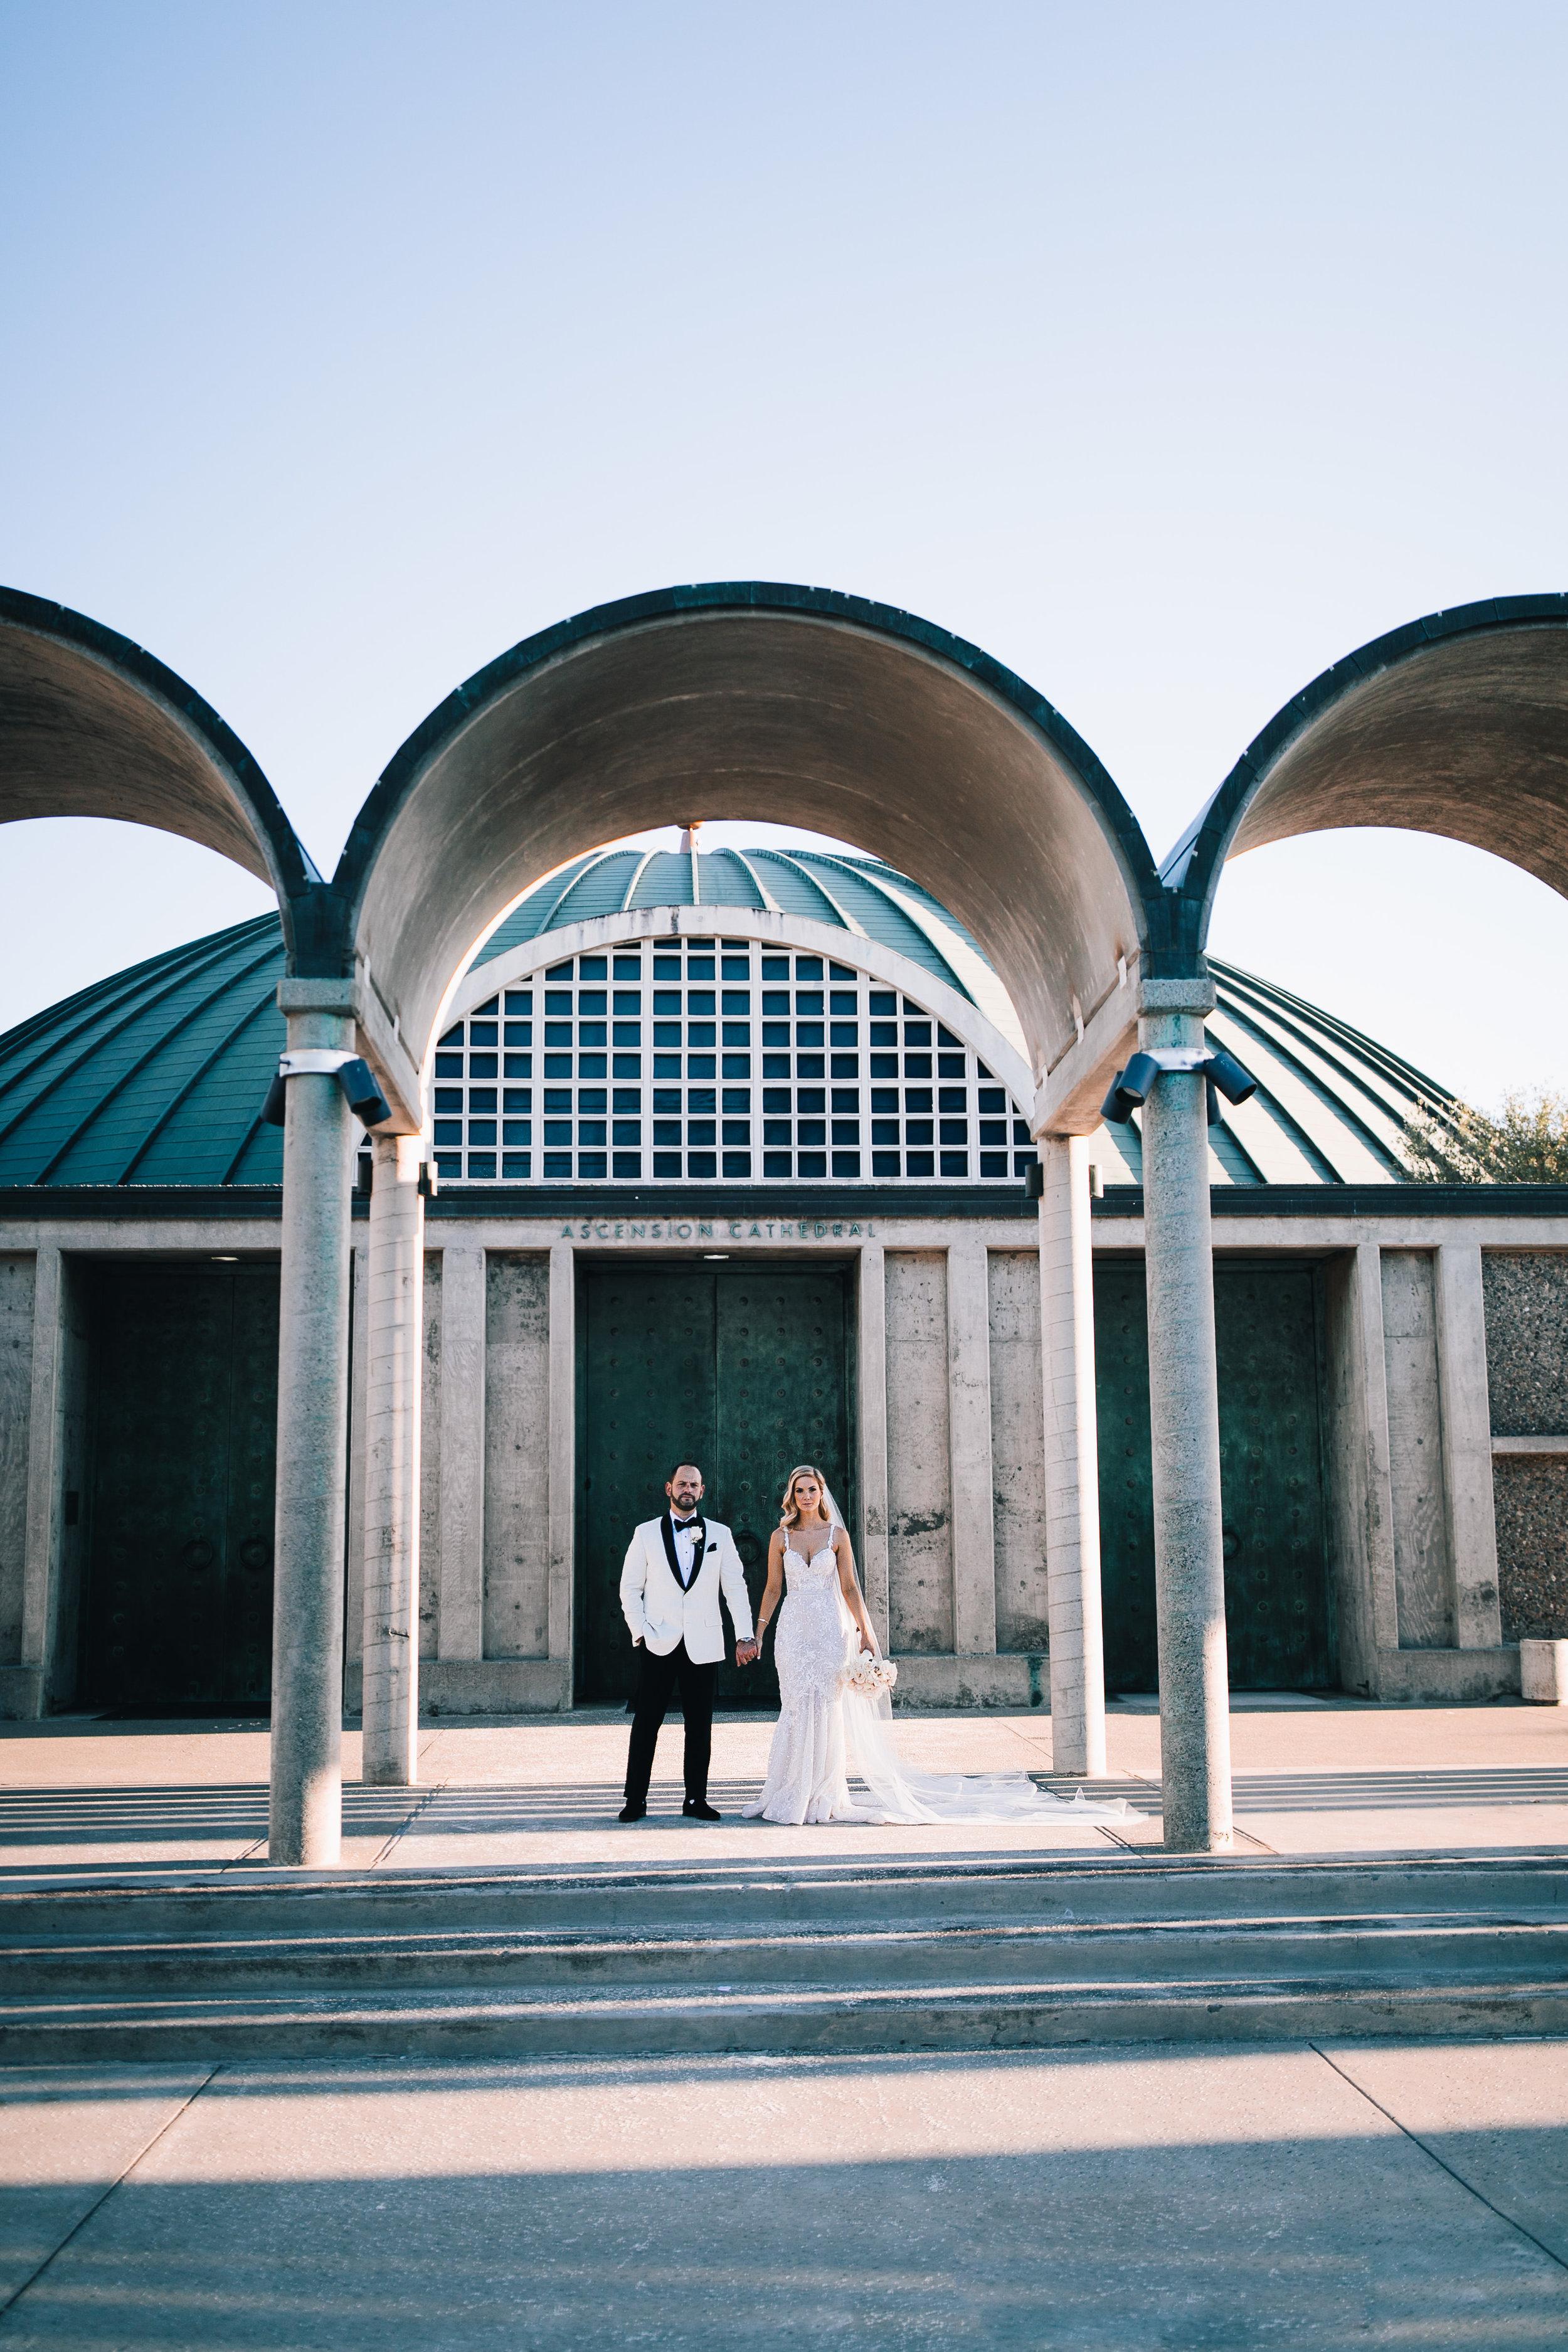 2018.09.08 Litsa and Sofo Greek Wedding Sneak Peak-14.jpg